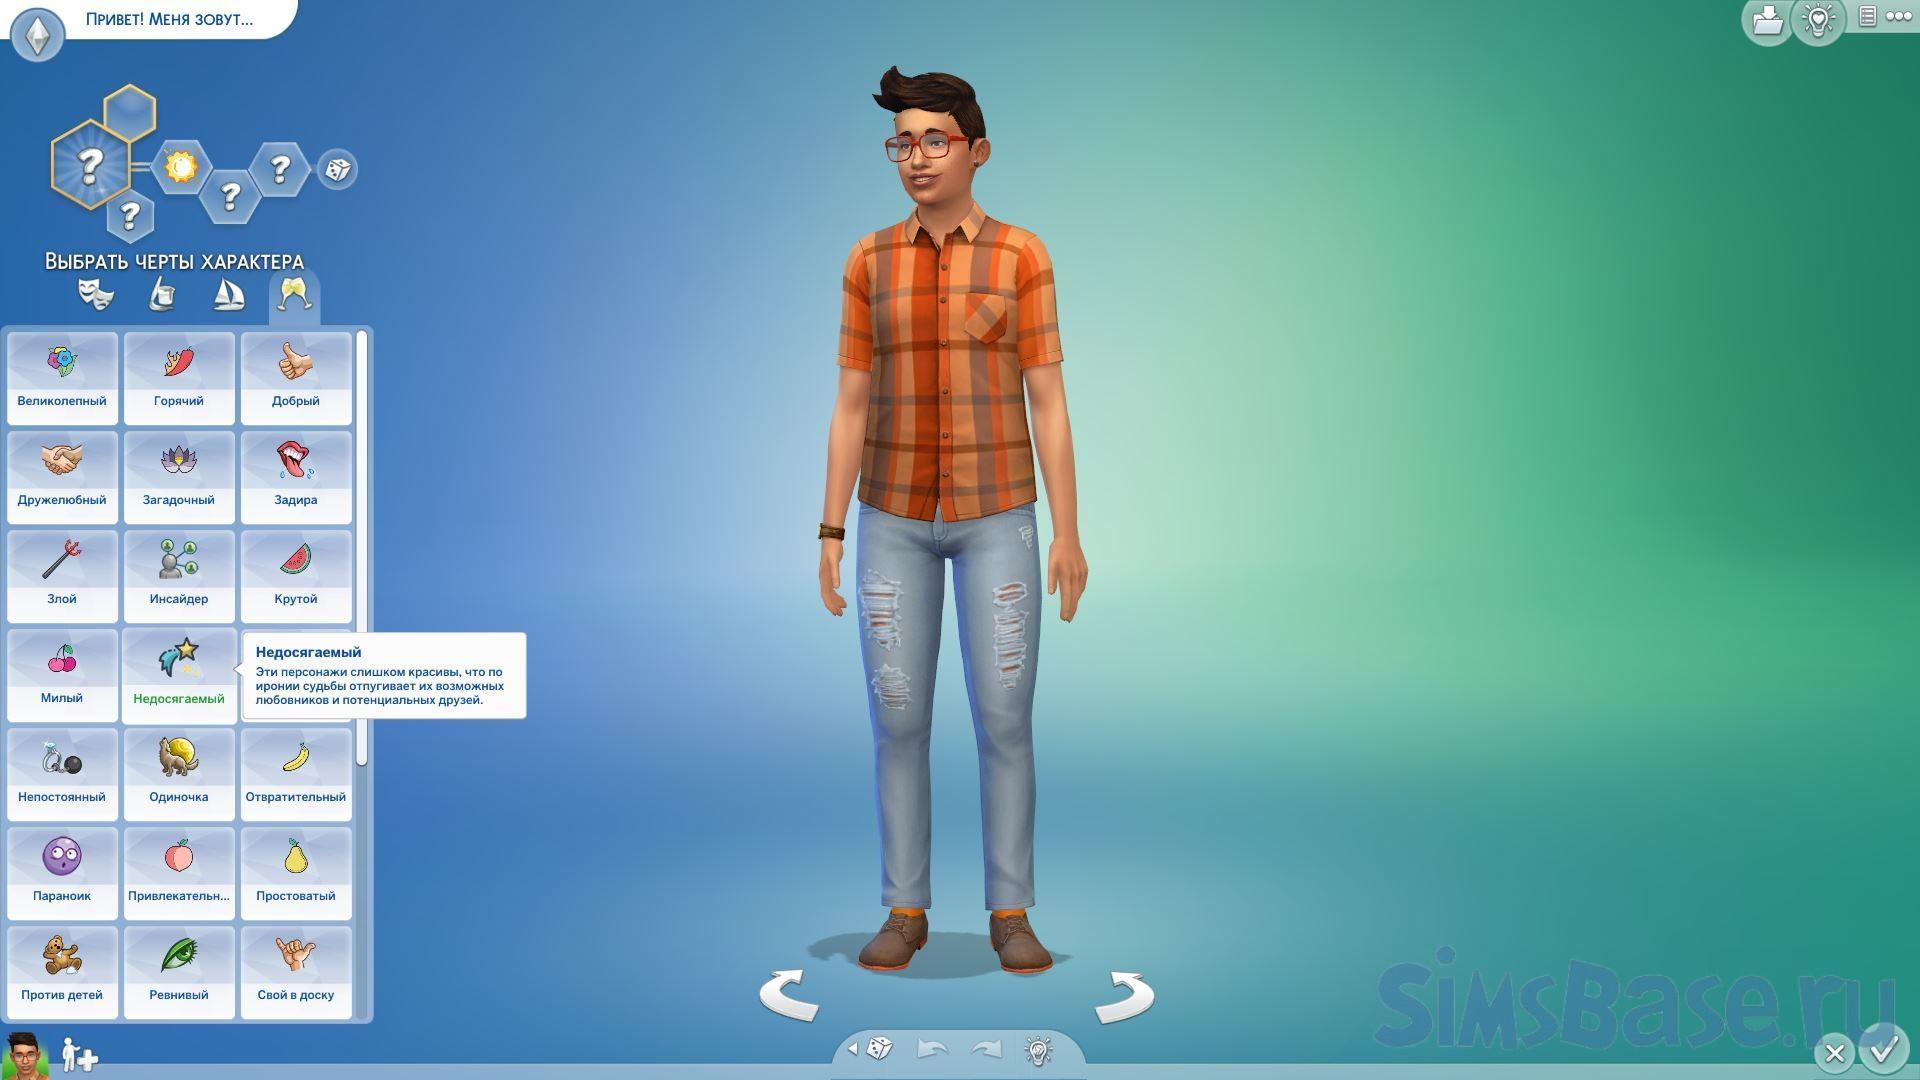 Мод «100 черт характера версия 2» от Vicky Sims для Sims 4